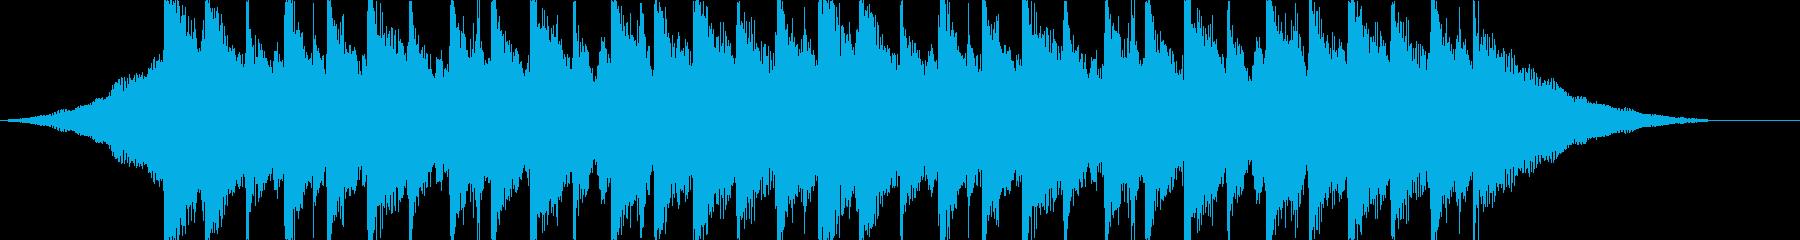 CM、サウンドロゴ、透明感のあるアコギ曲の再生済みの波形